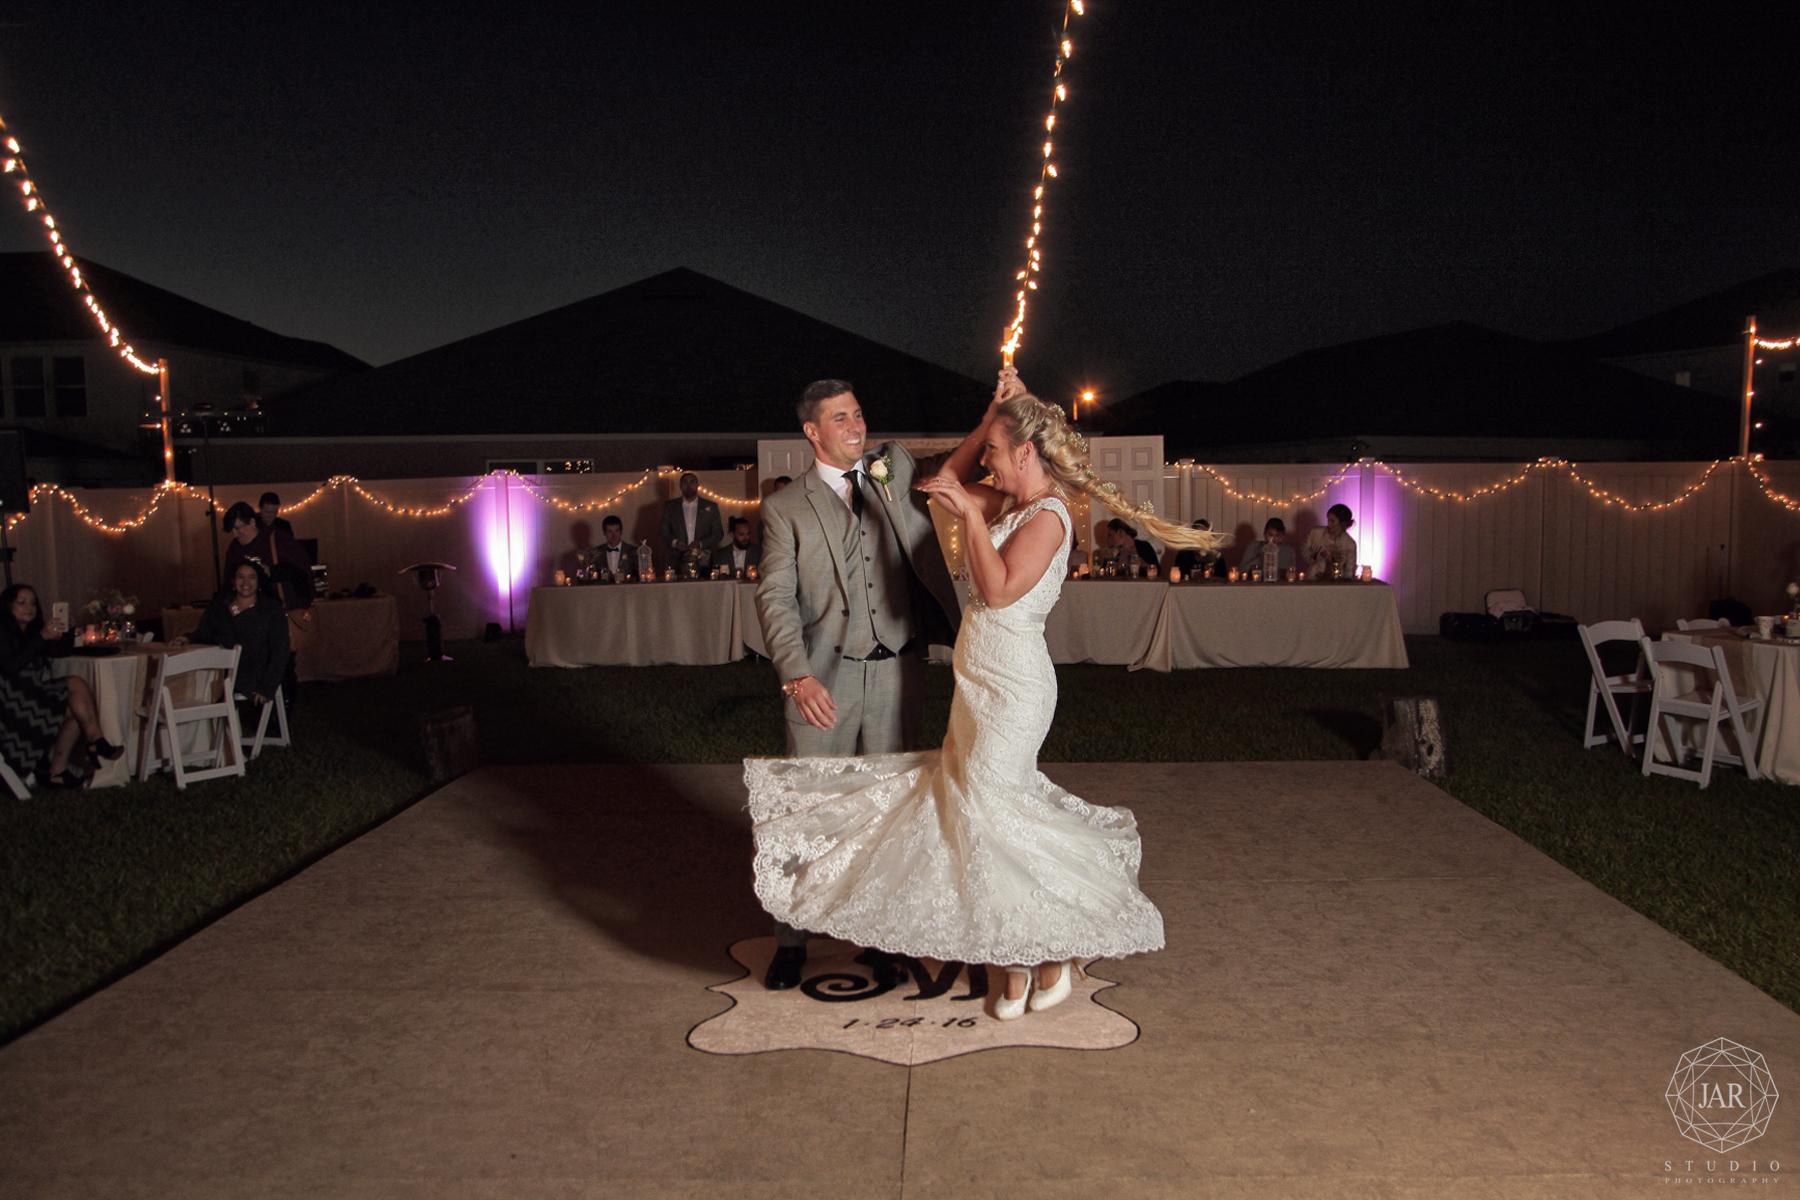 42-backyard-wedding-dancing-bride-jarstudio.JPG